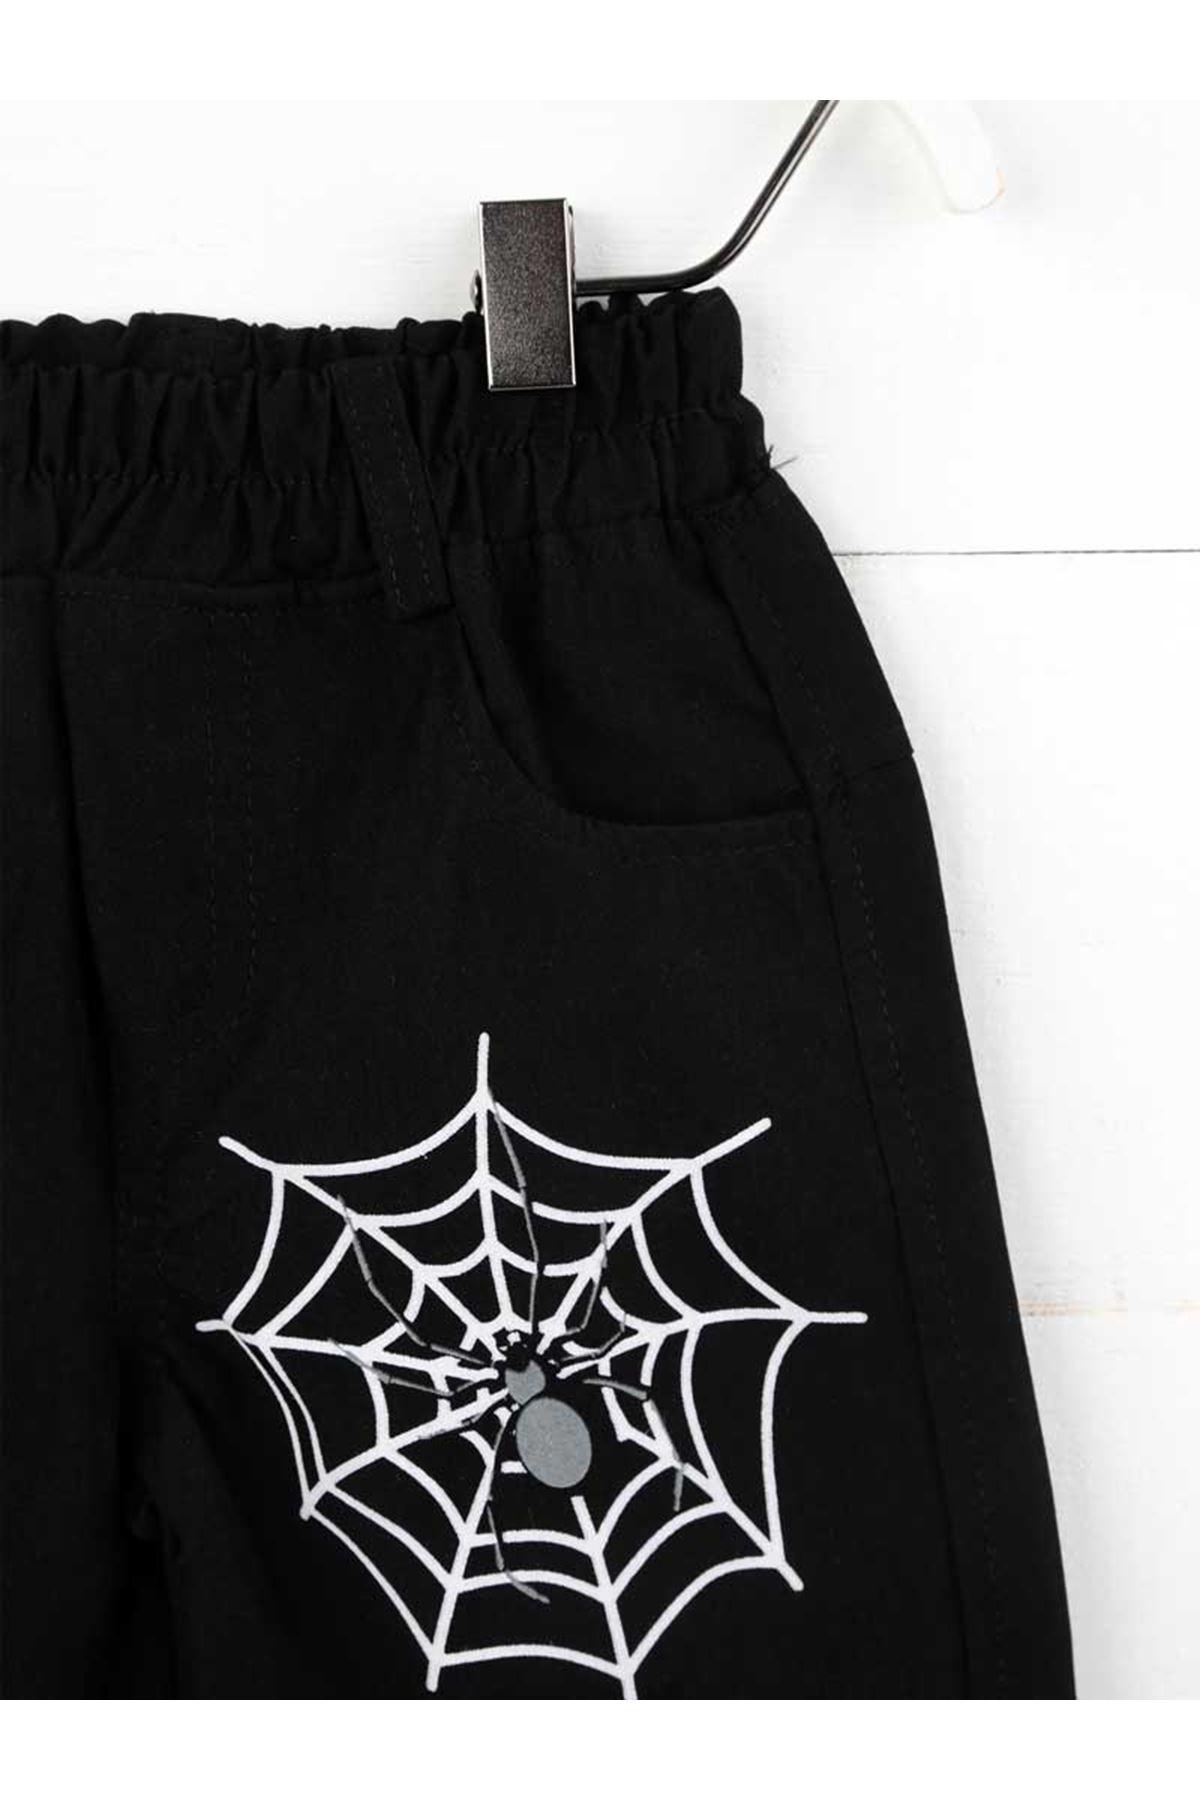 Sax Summery Shorts Male Child Suit